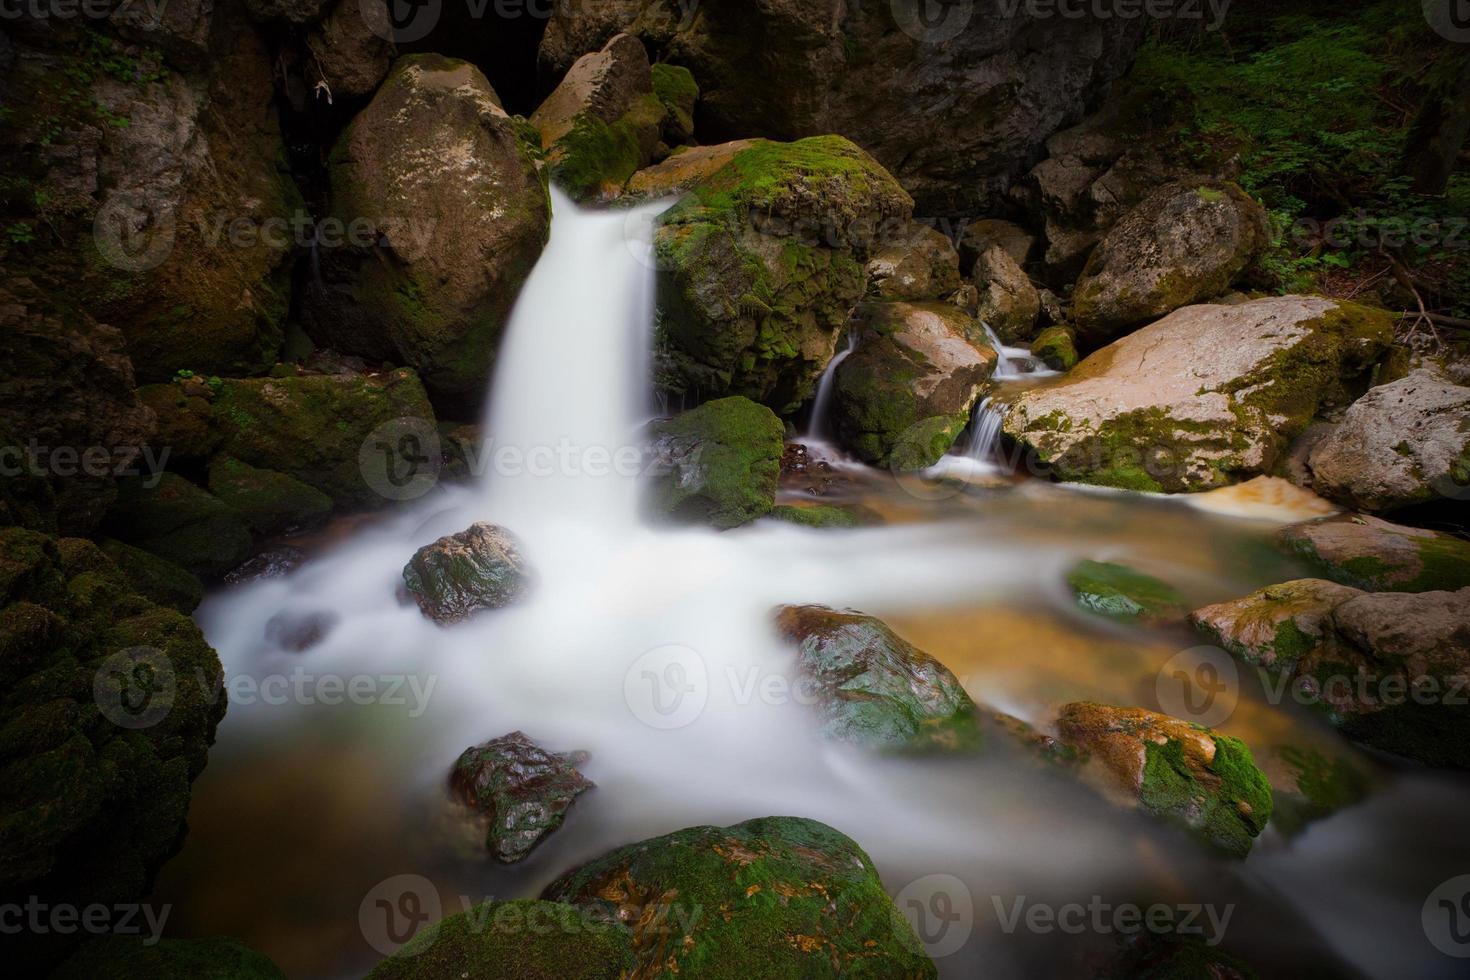 vattenfall nära upp i berget foto